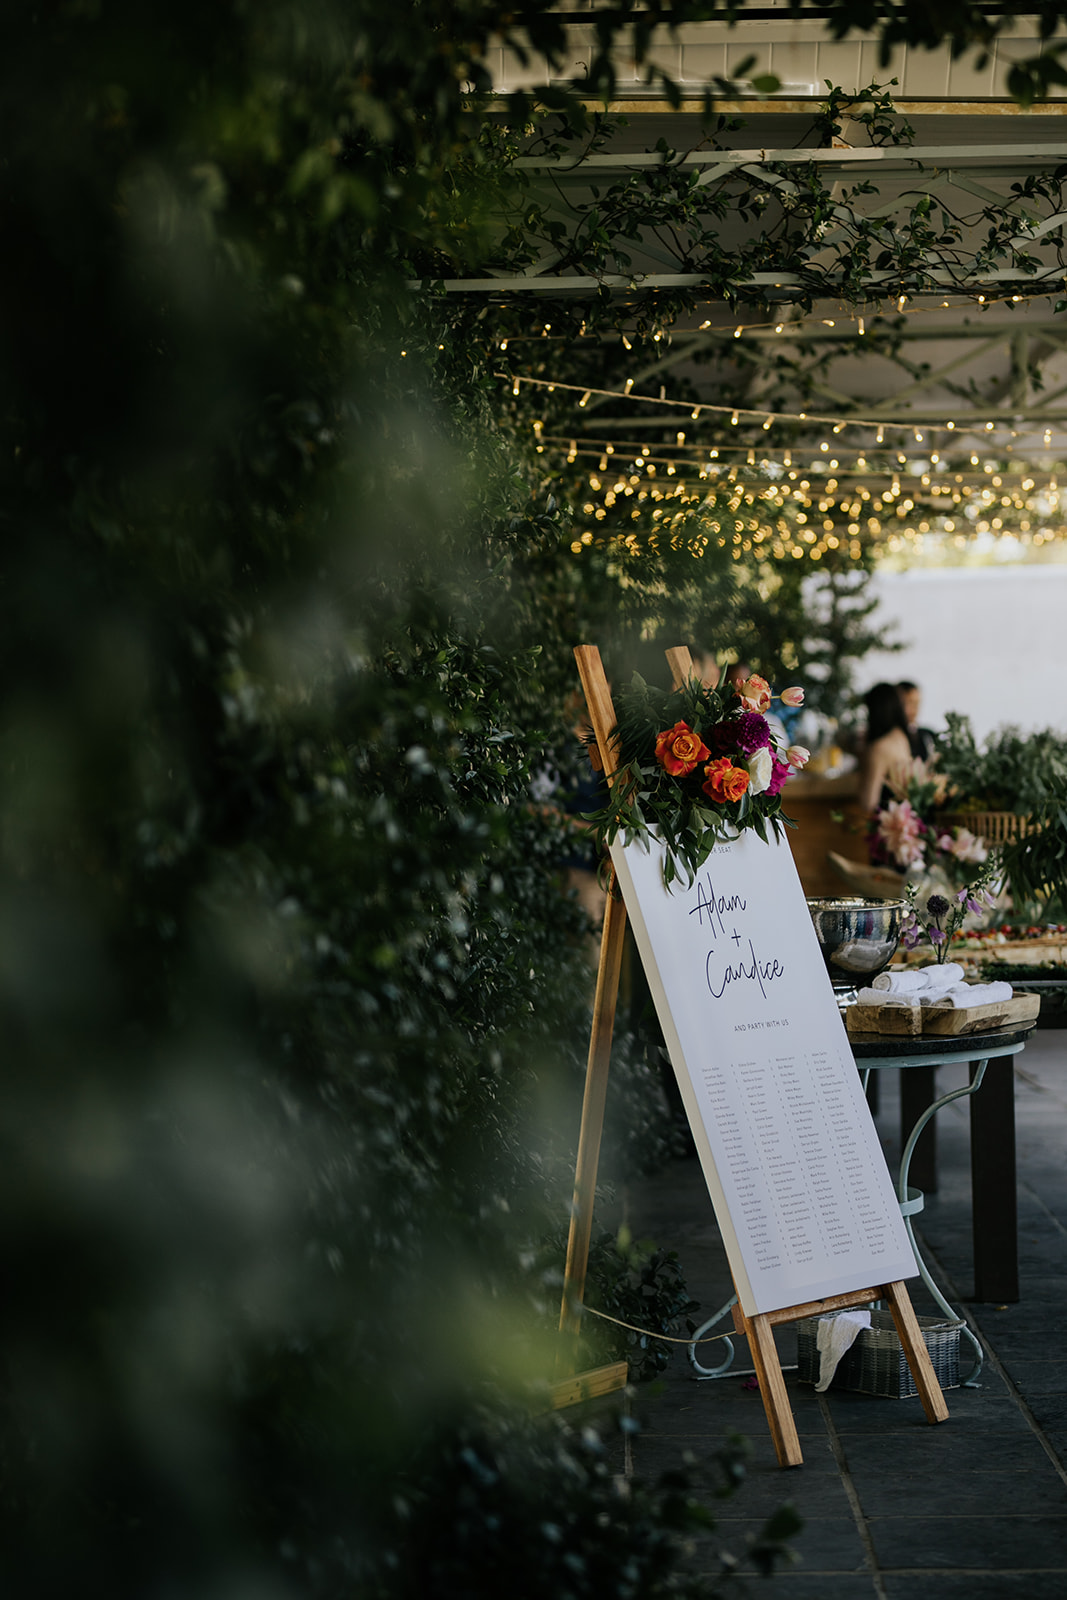 Wildeflower Cape Town wedding luxury flowers 8